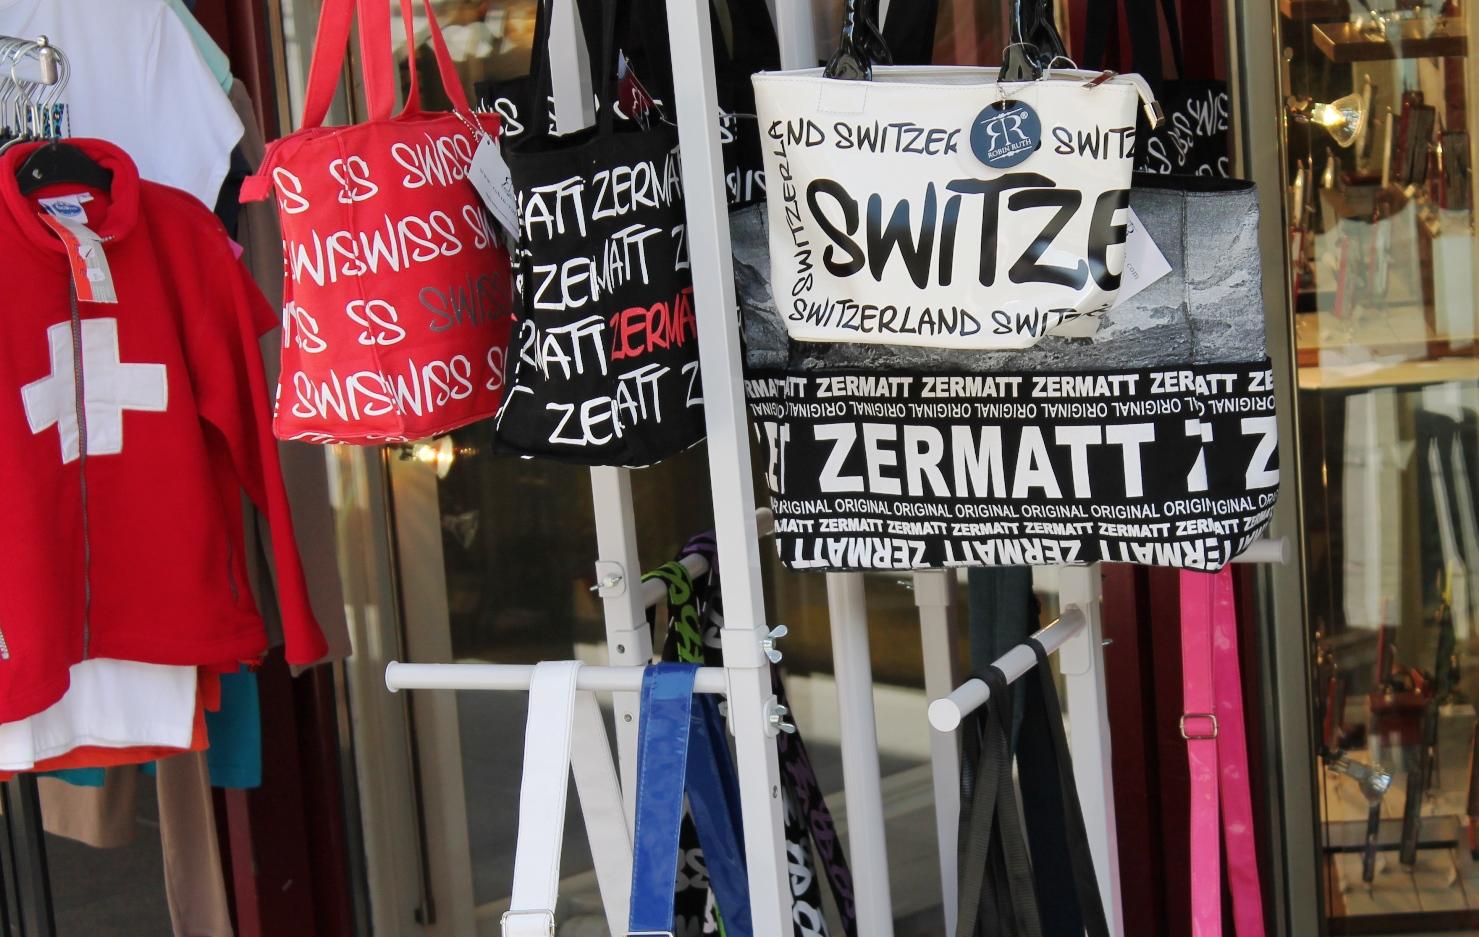 From Chamonix, France to Zermatt, Switzerland by rail